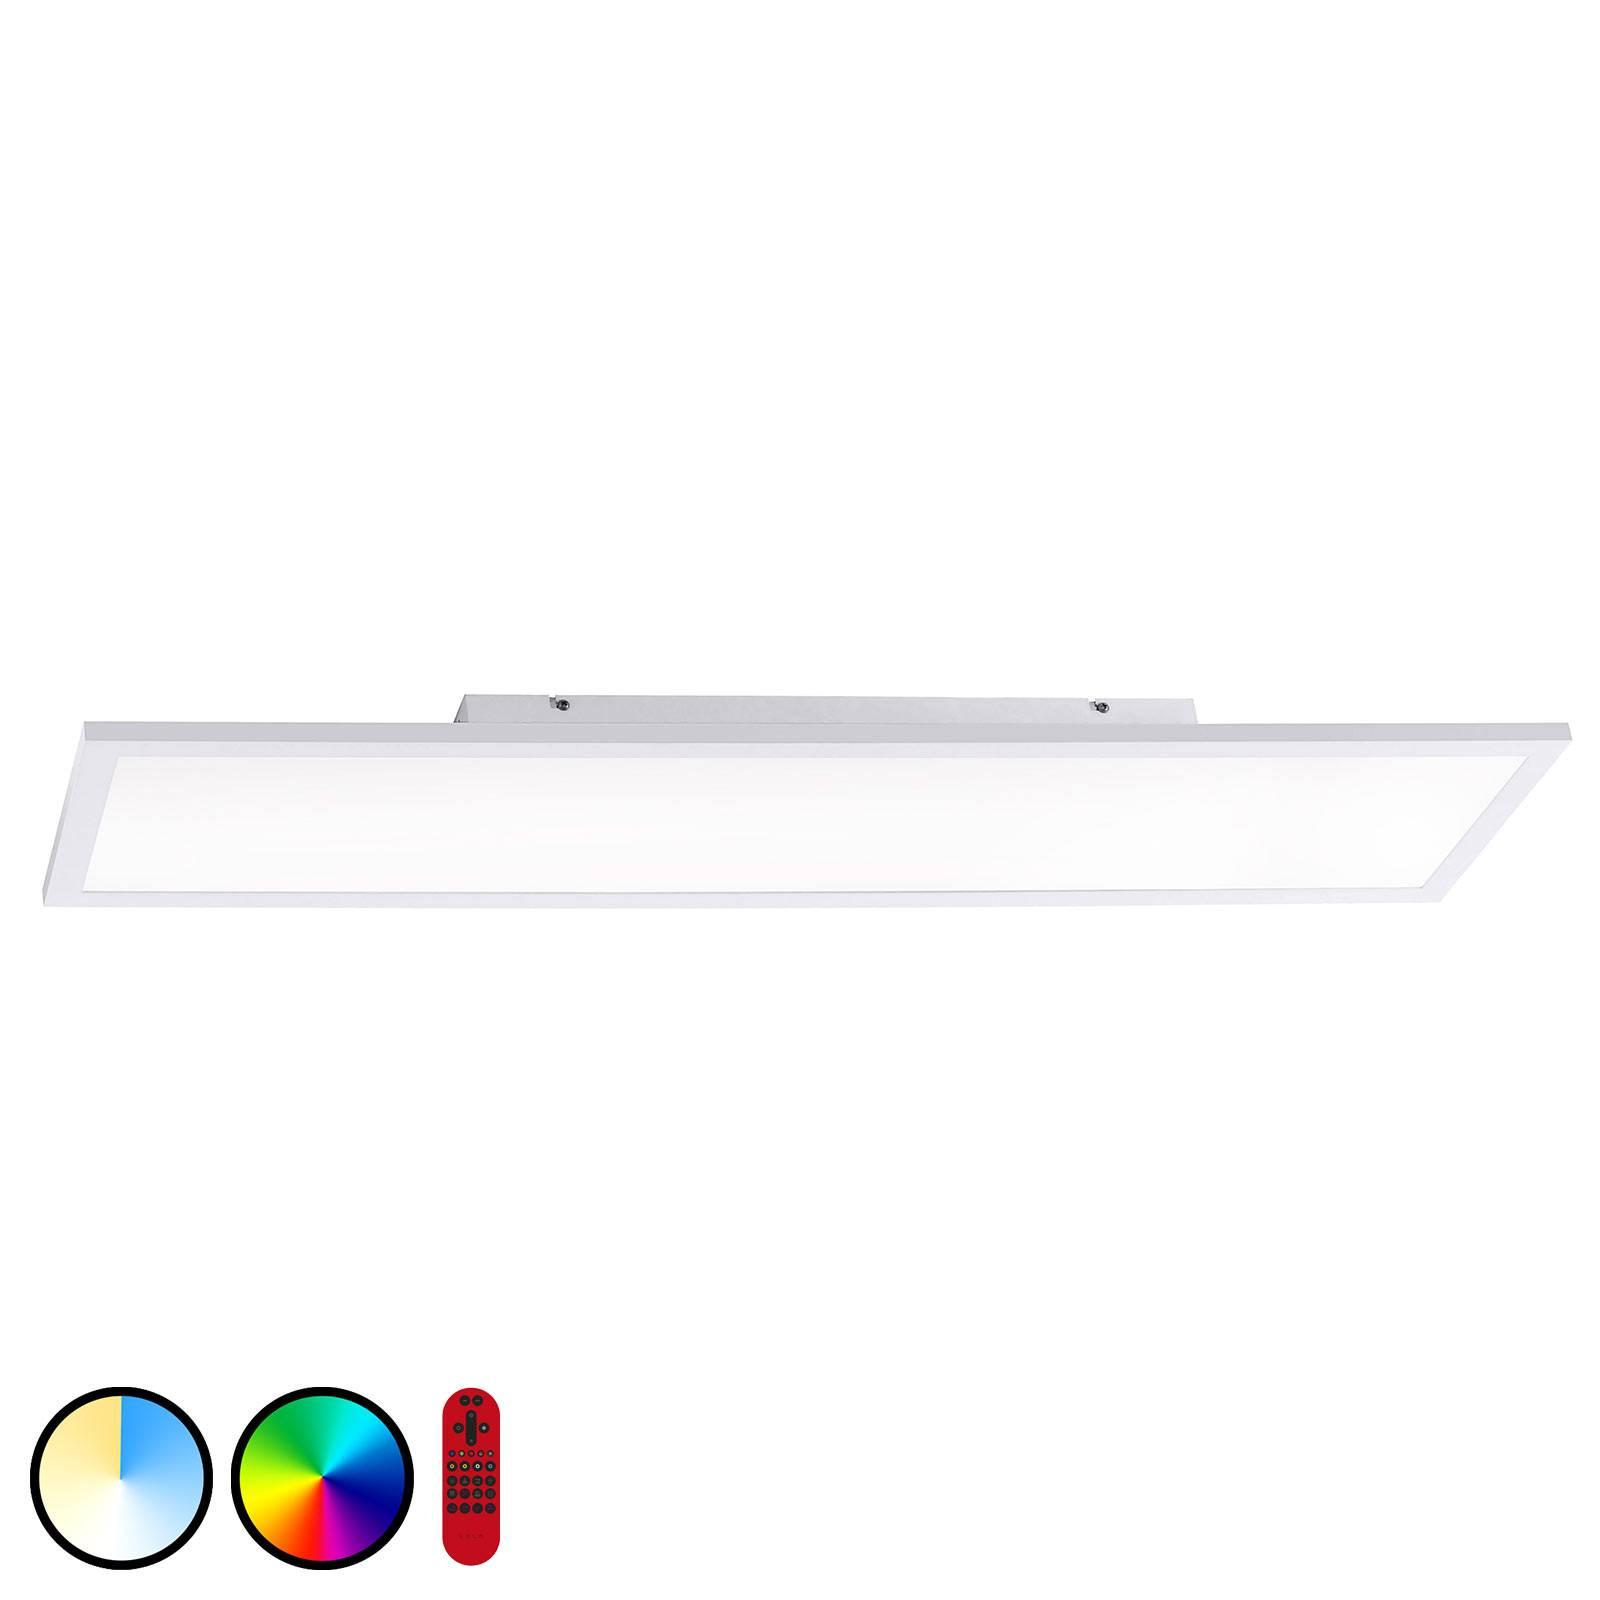 LED-Deckenleuchte LOLAsmart Flat, 100 x 25 cm